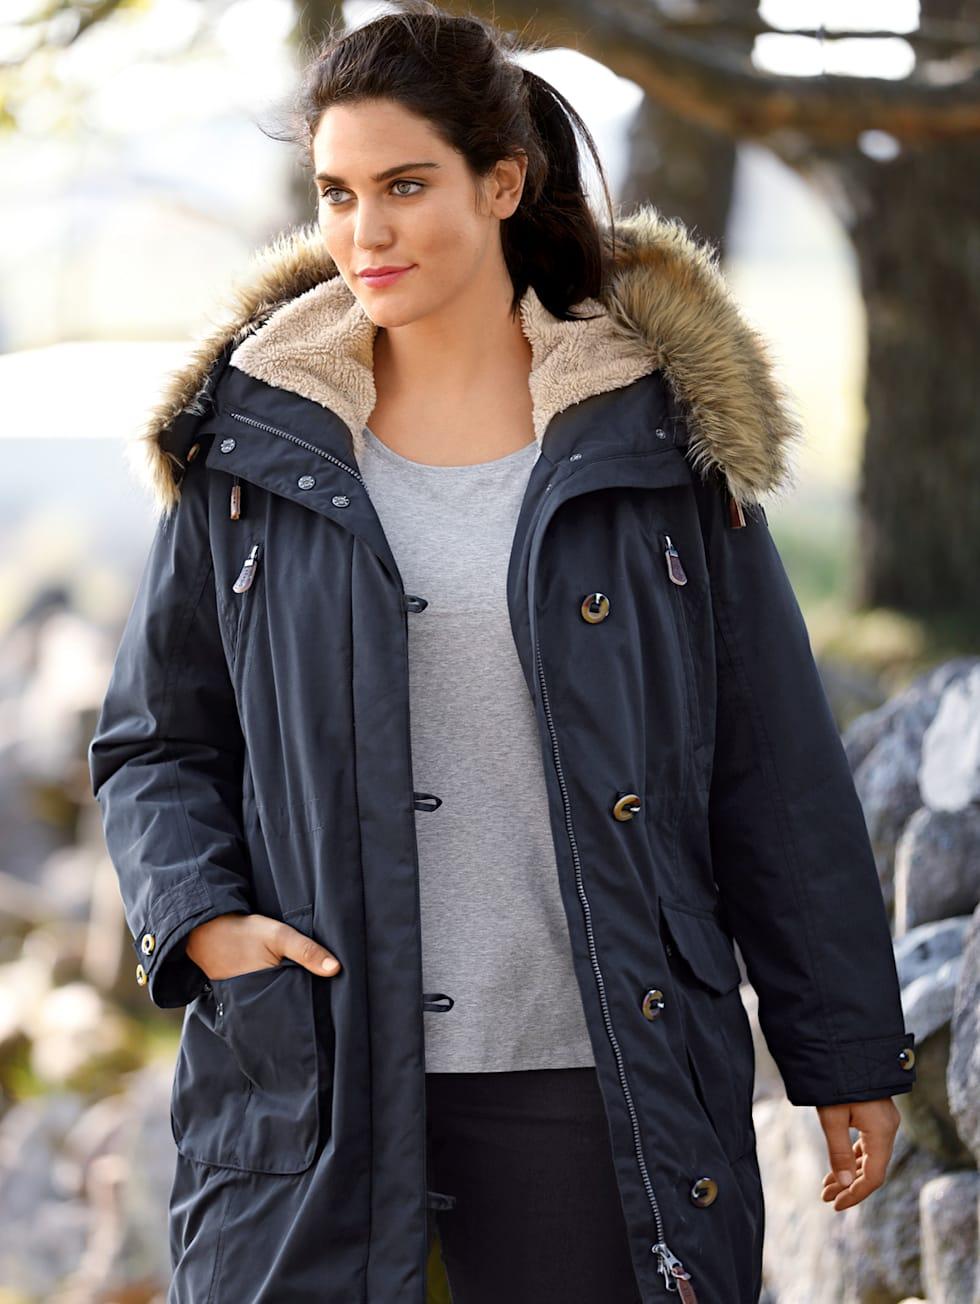 MIAMODA Große Größen Jacken Outfits